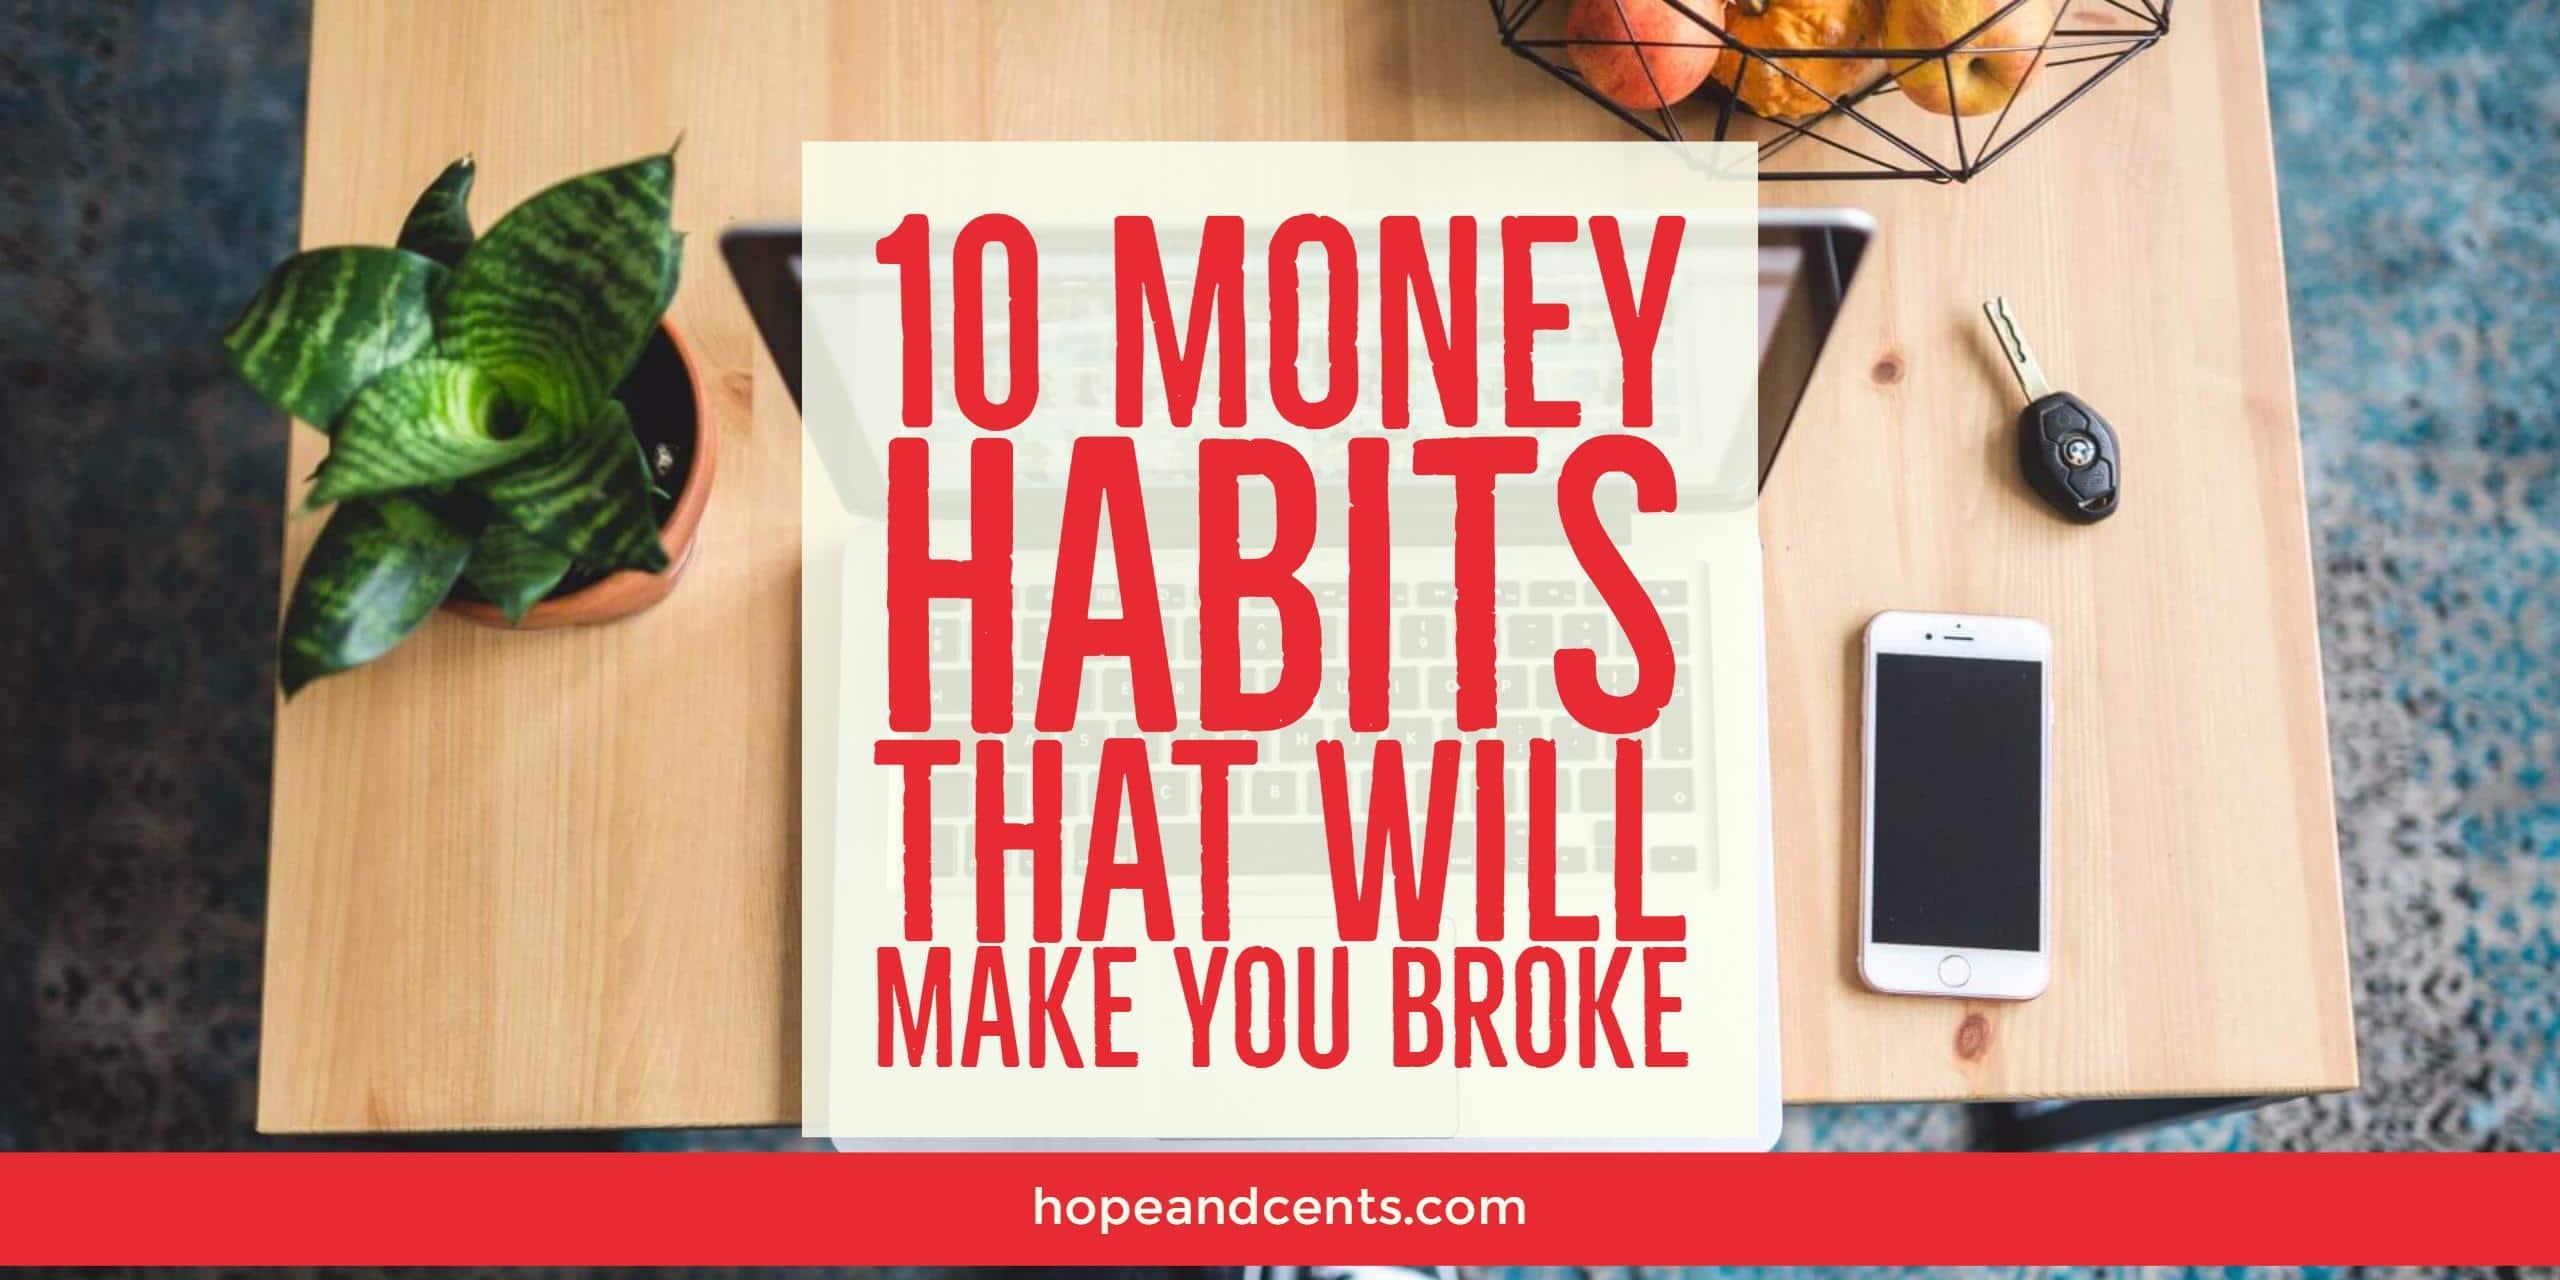 10 Money Habits That Will Make You Broke